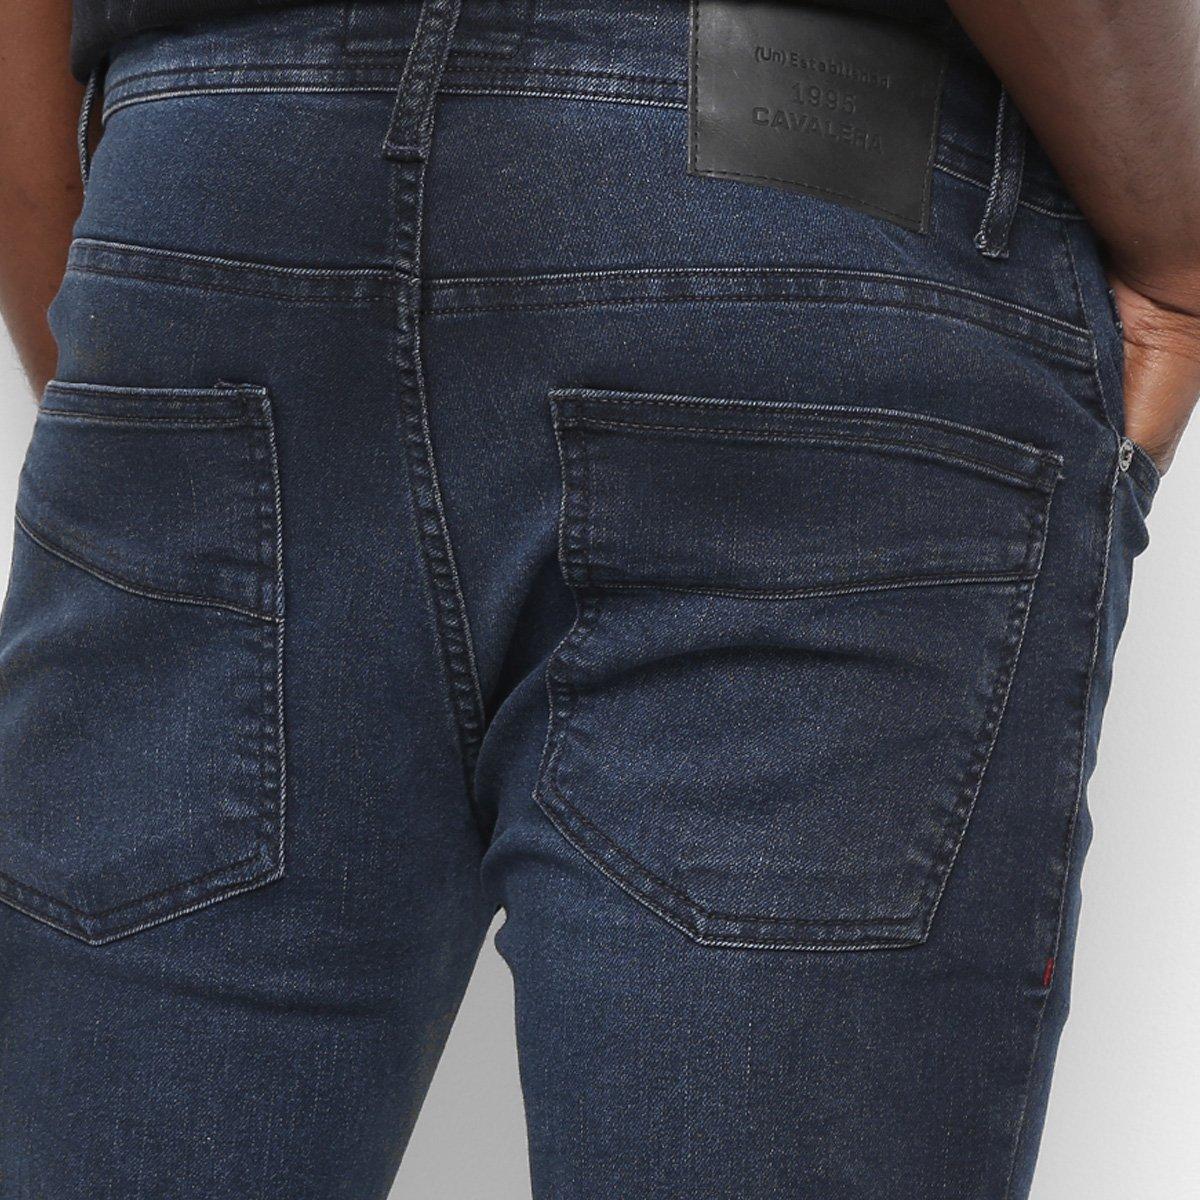 Calça Jeans Cavalera Jamie Super Skinny Masculina - Azul